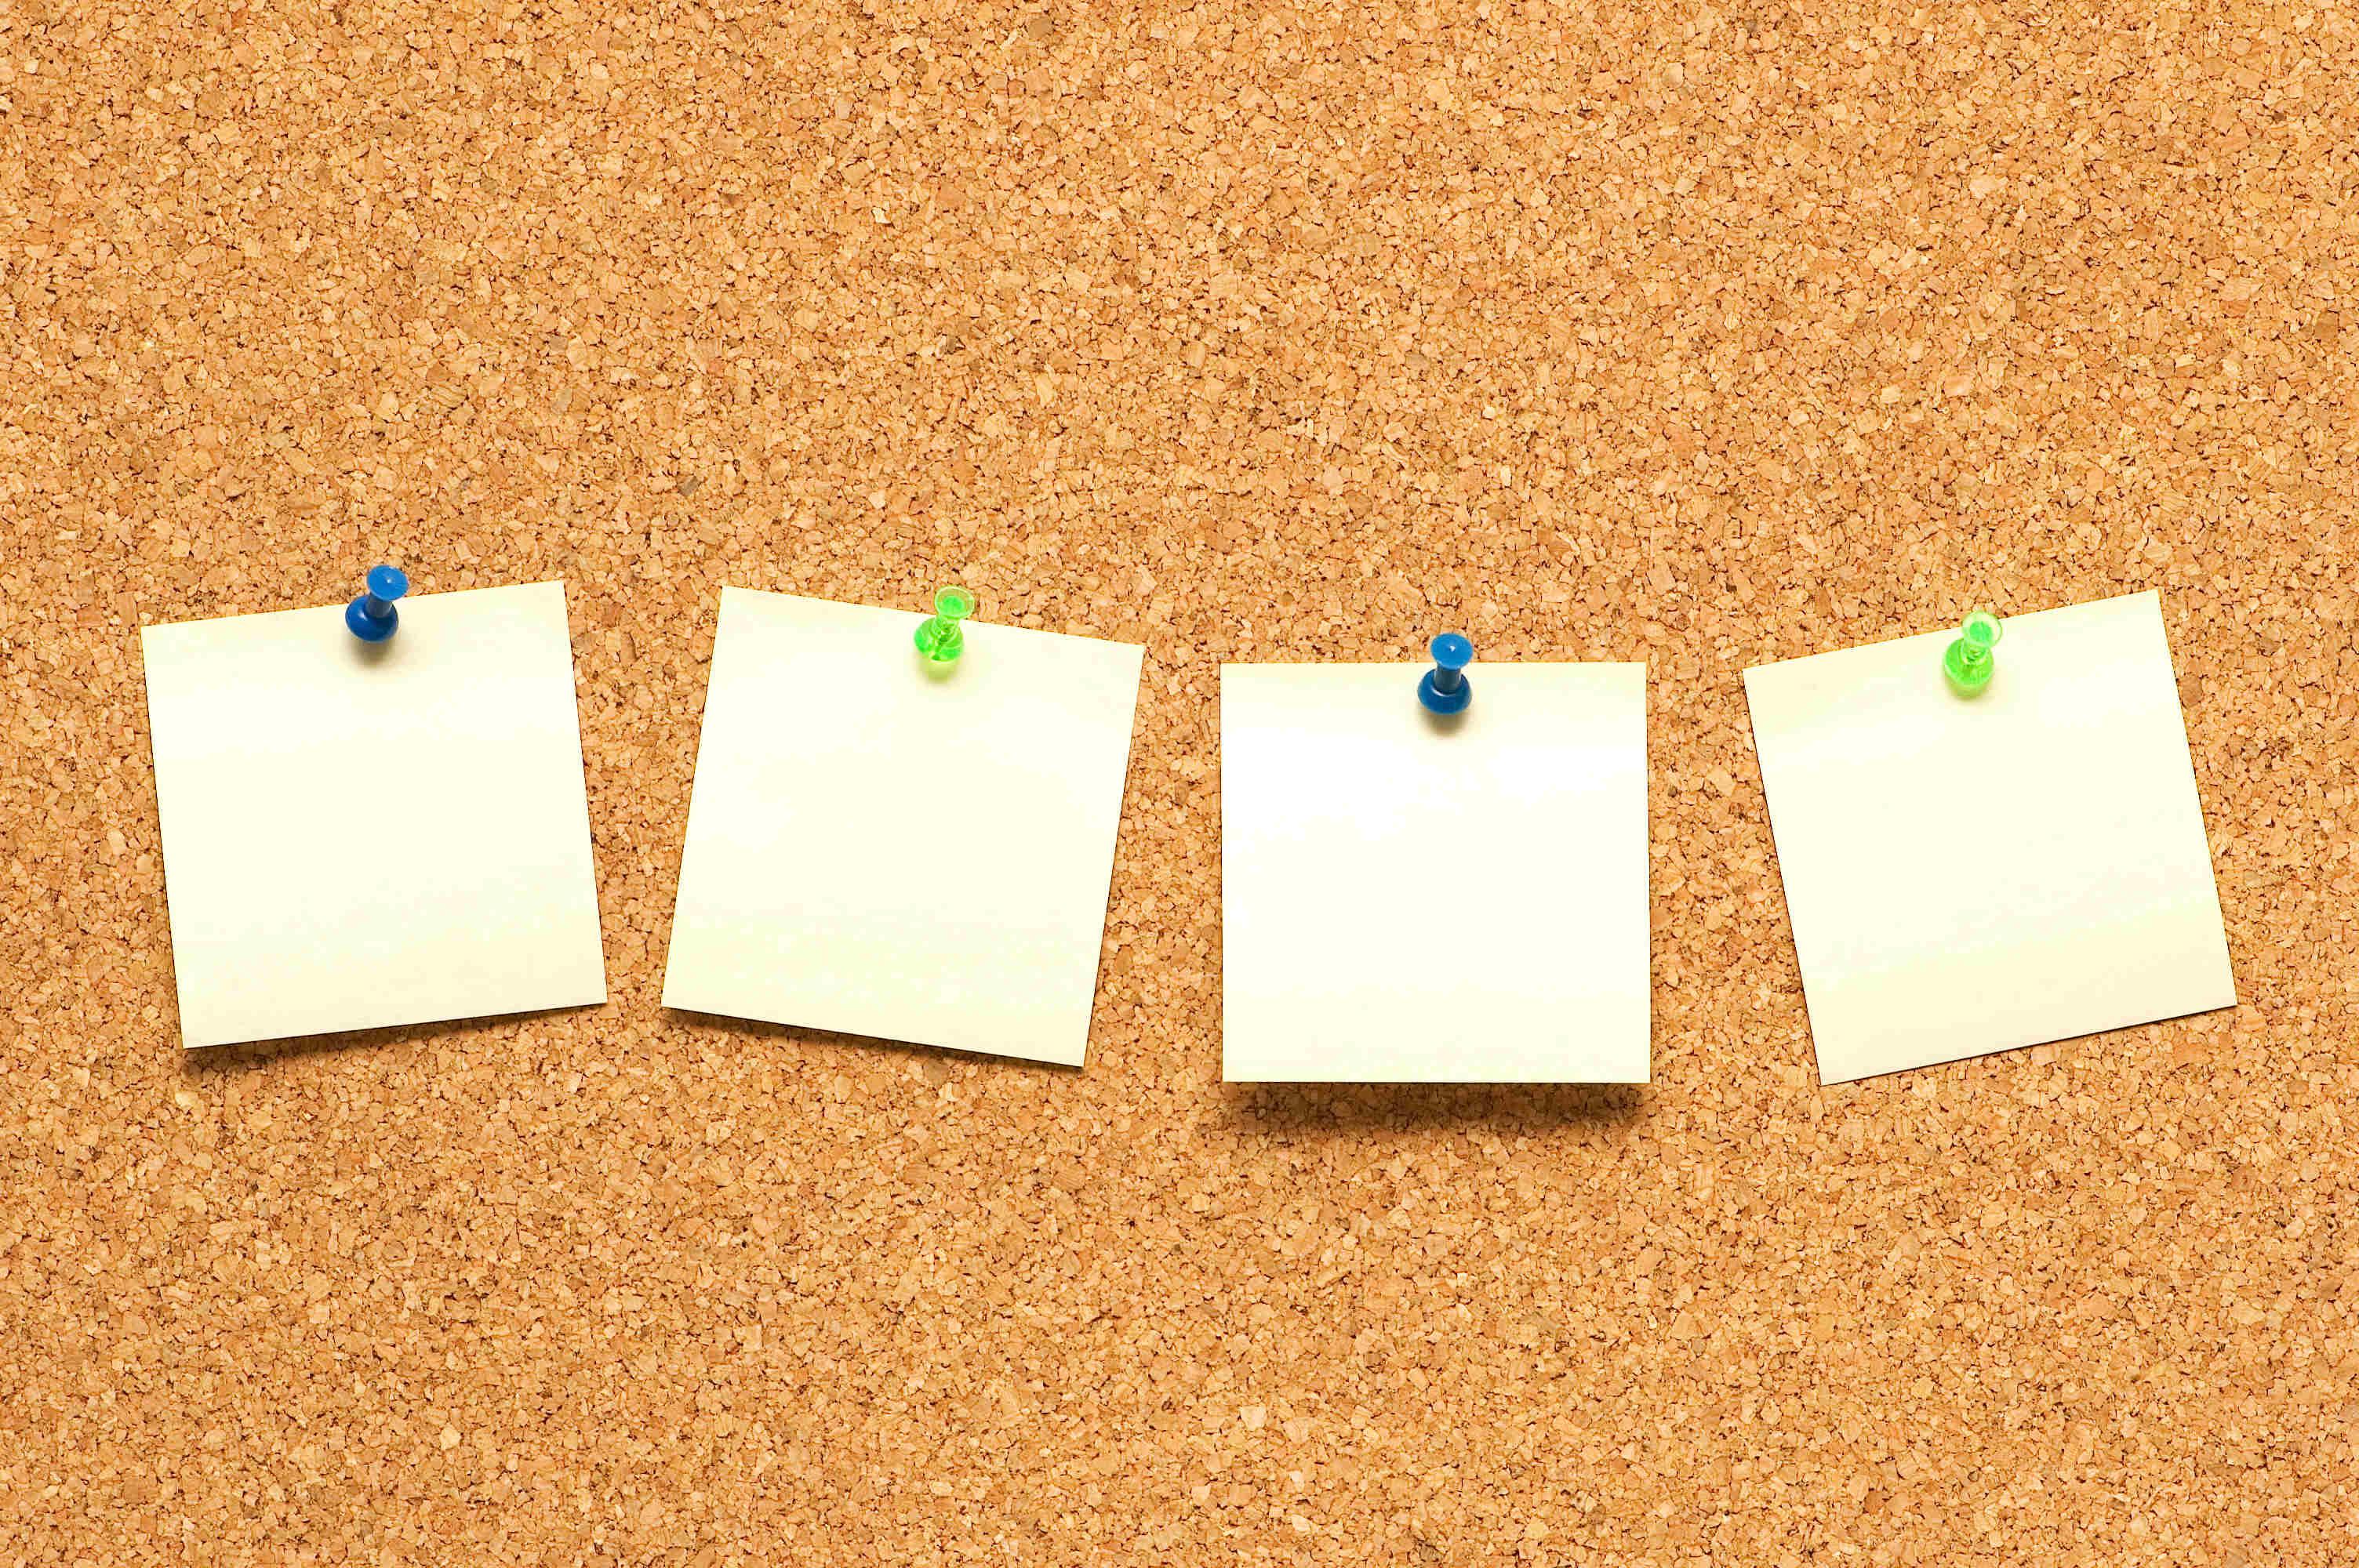 P background image css - Background Ffffff Url Https Peda Net P Lahti Pyry Kuvat Kuvat P2 File Download Fce6e5a64527bcfd89e2a21e7686943010215d32 Post It Notes Board Jpg Quot